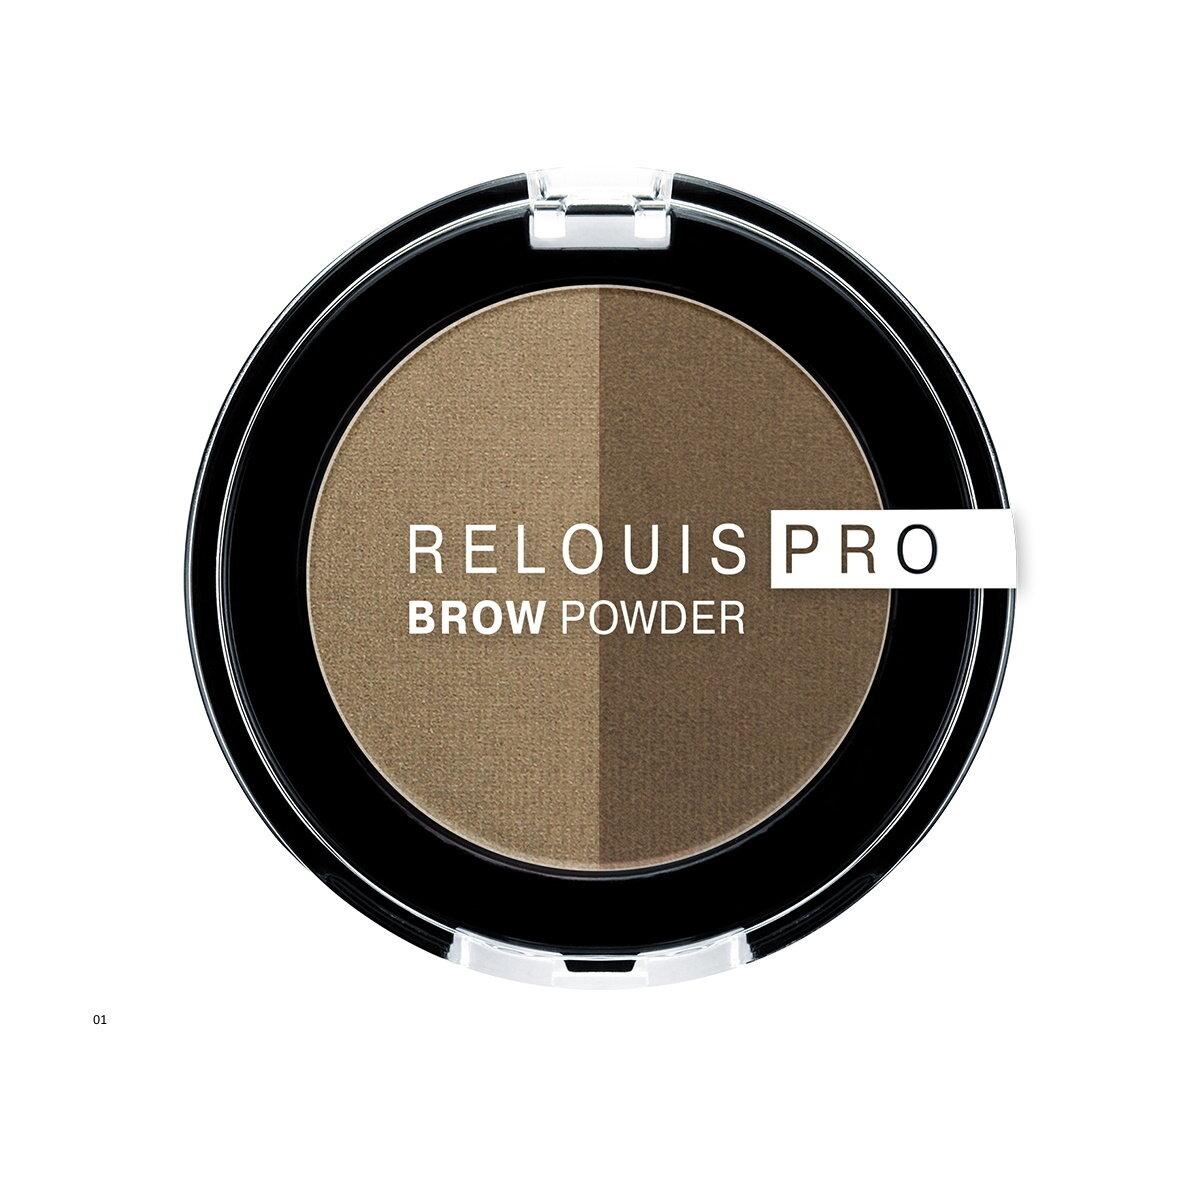 RELOUIS PRO BROW POWDER 3 colors | ТЕНИ ДЛЯ БРОВЕЙ